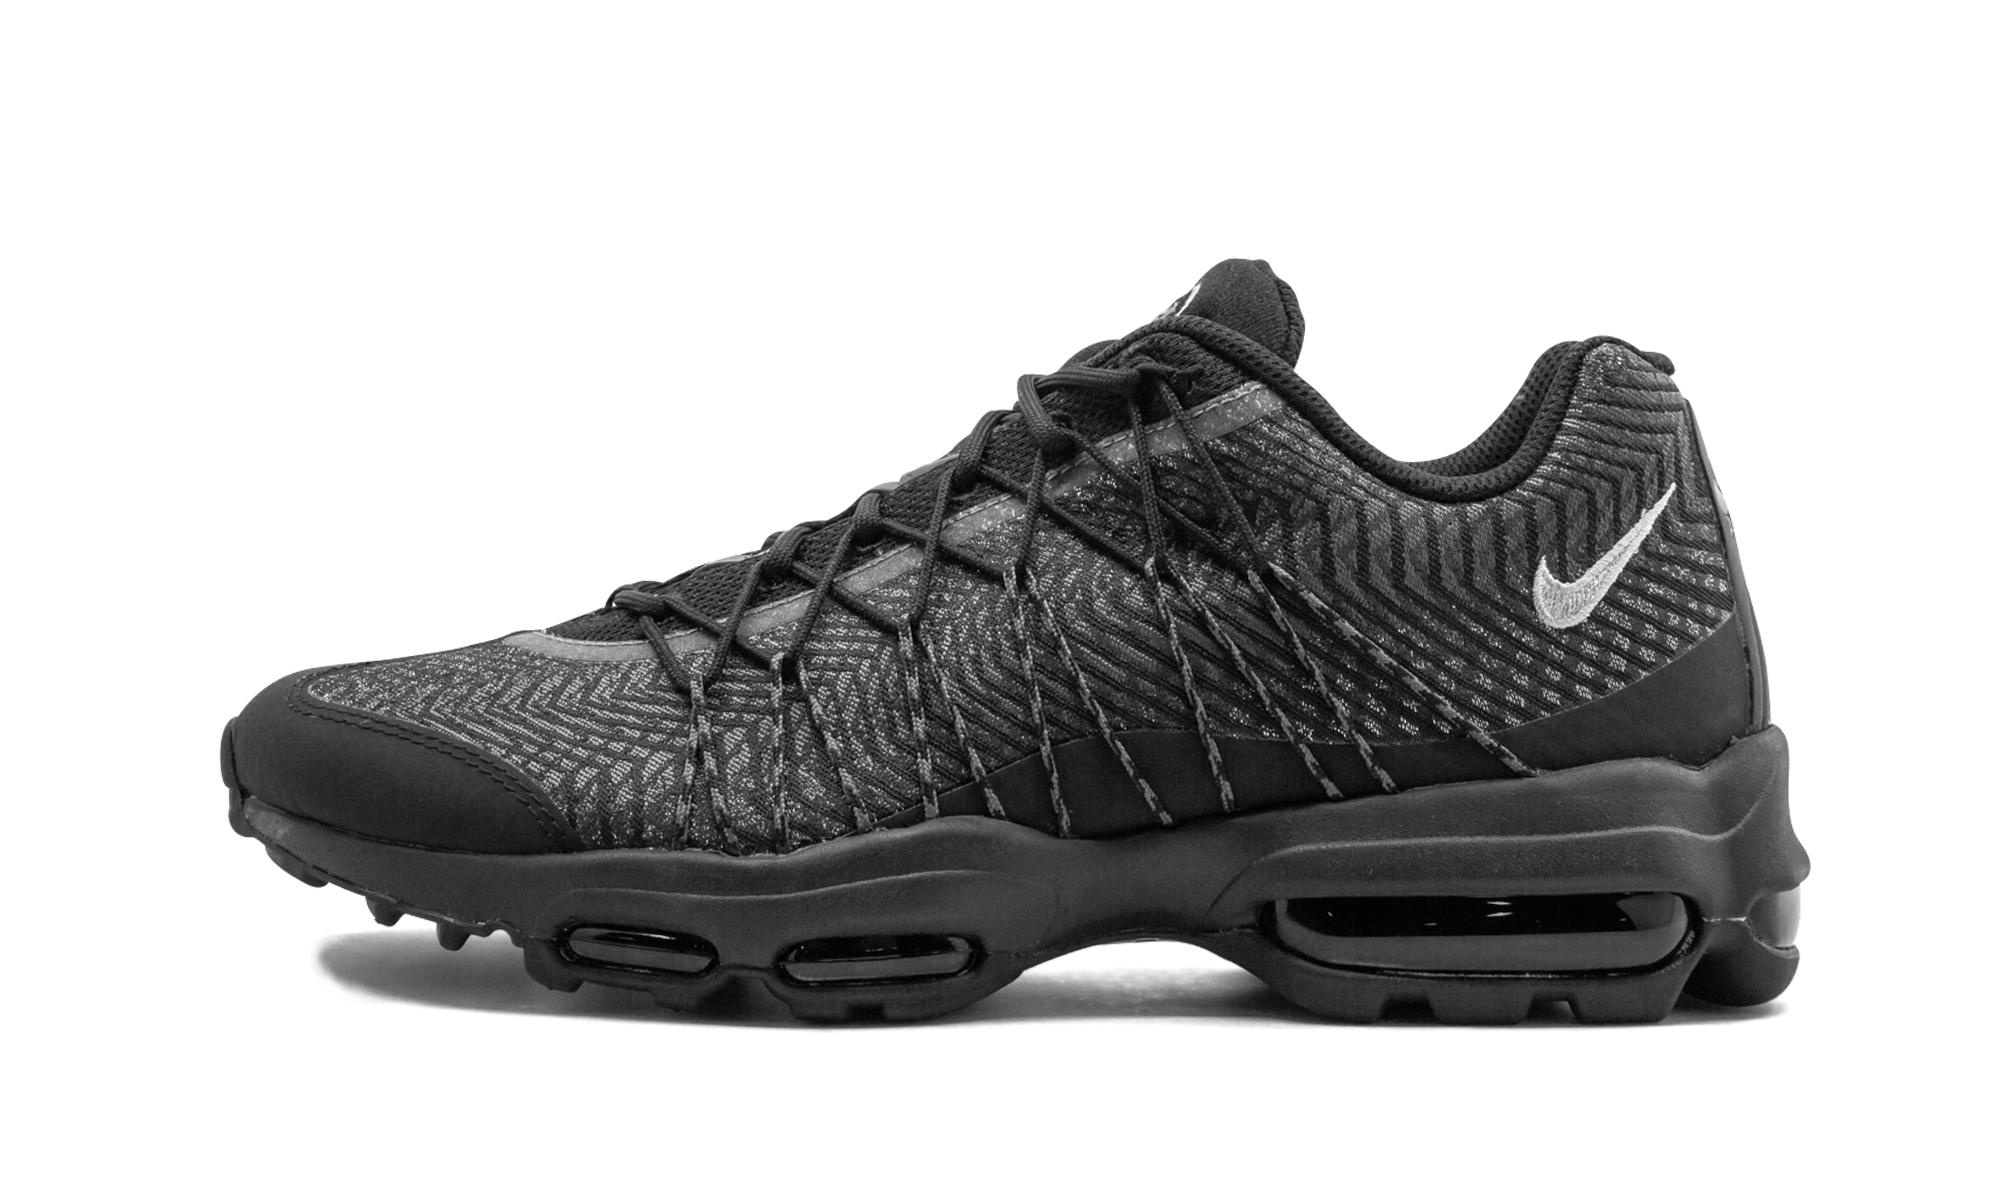 6d1bf1612c5e Nike Air Max 95 Ultra Jcrd in Black for Men - Lyst